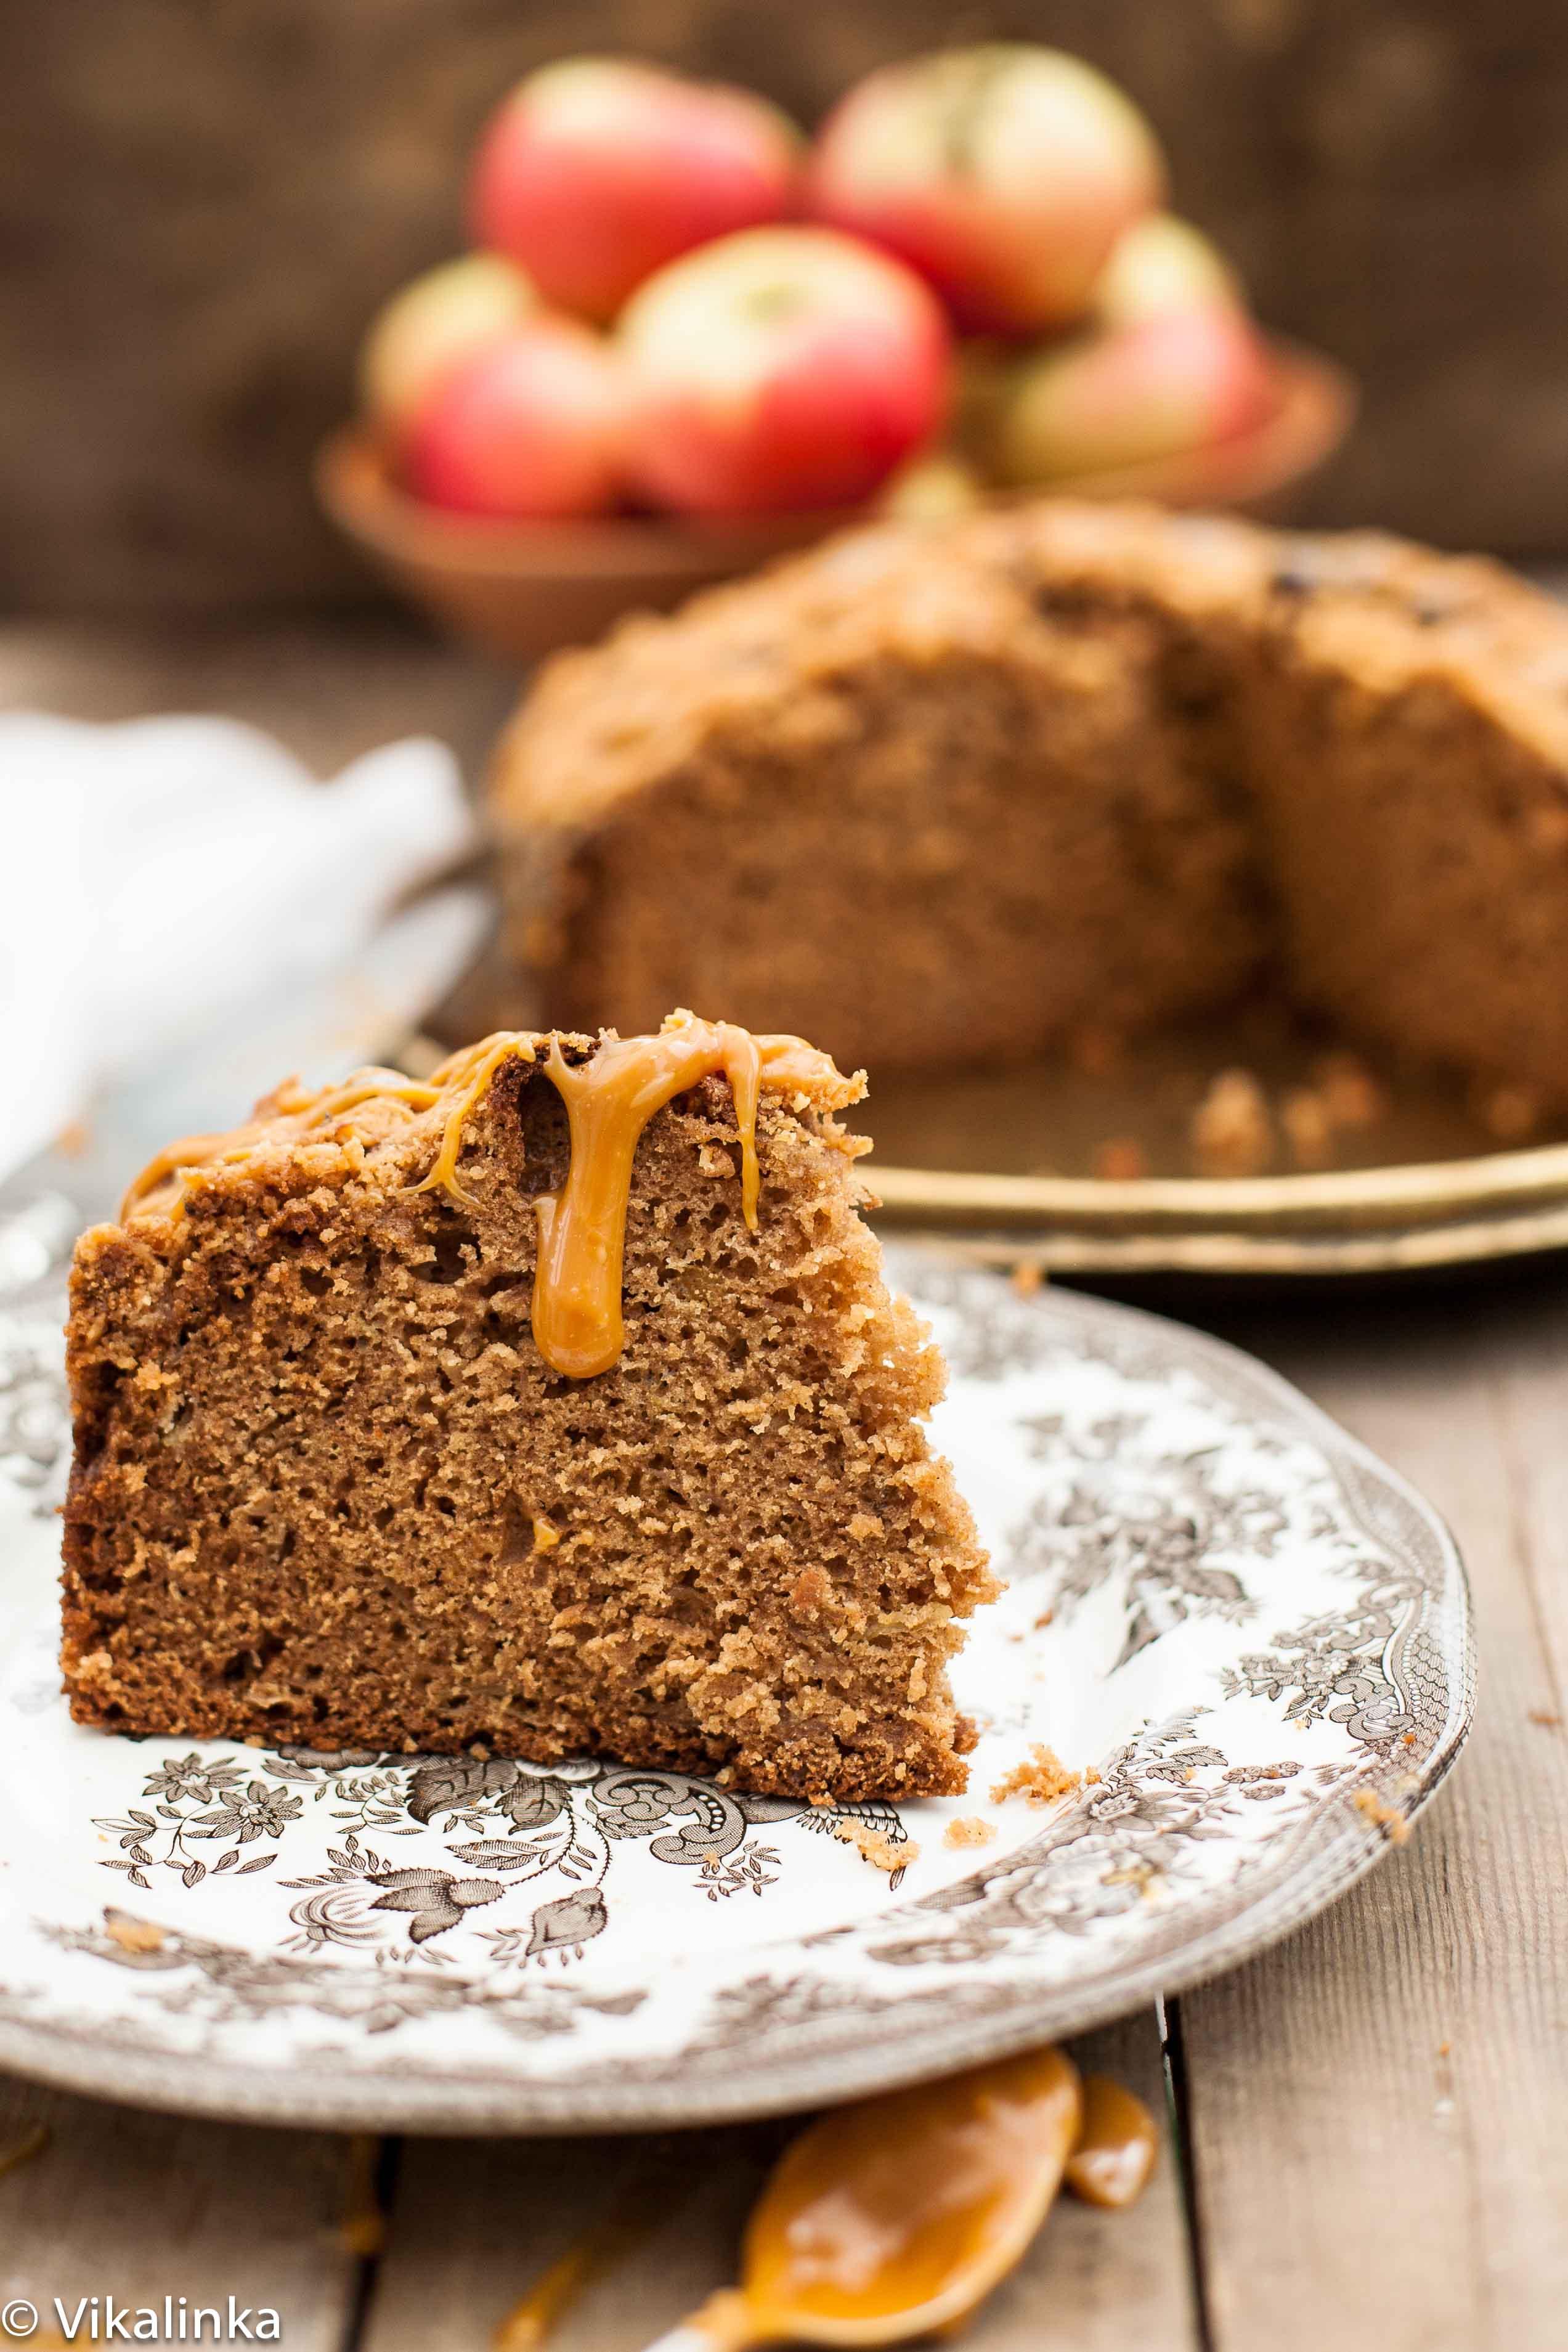 Apple Spice Streusel Cake with Salted Caramel Drizzle - Vikalinka